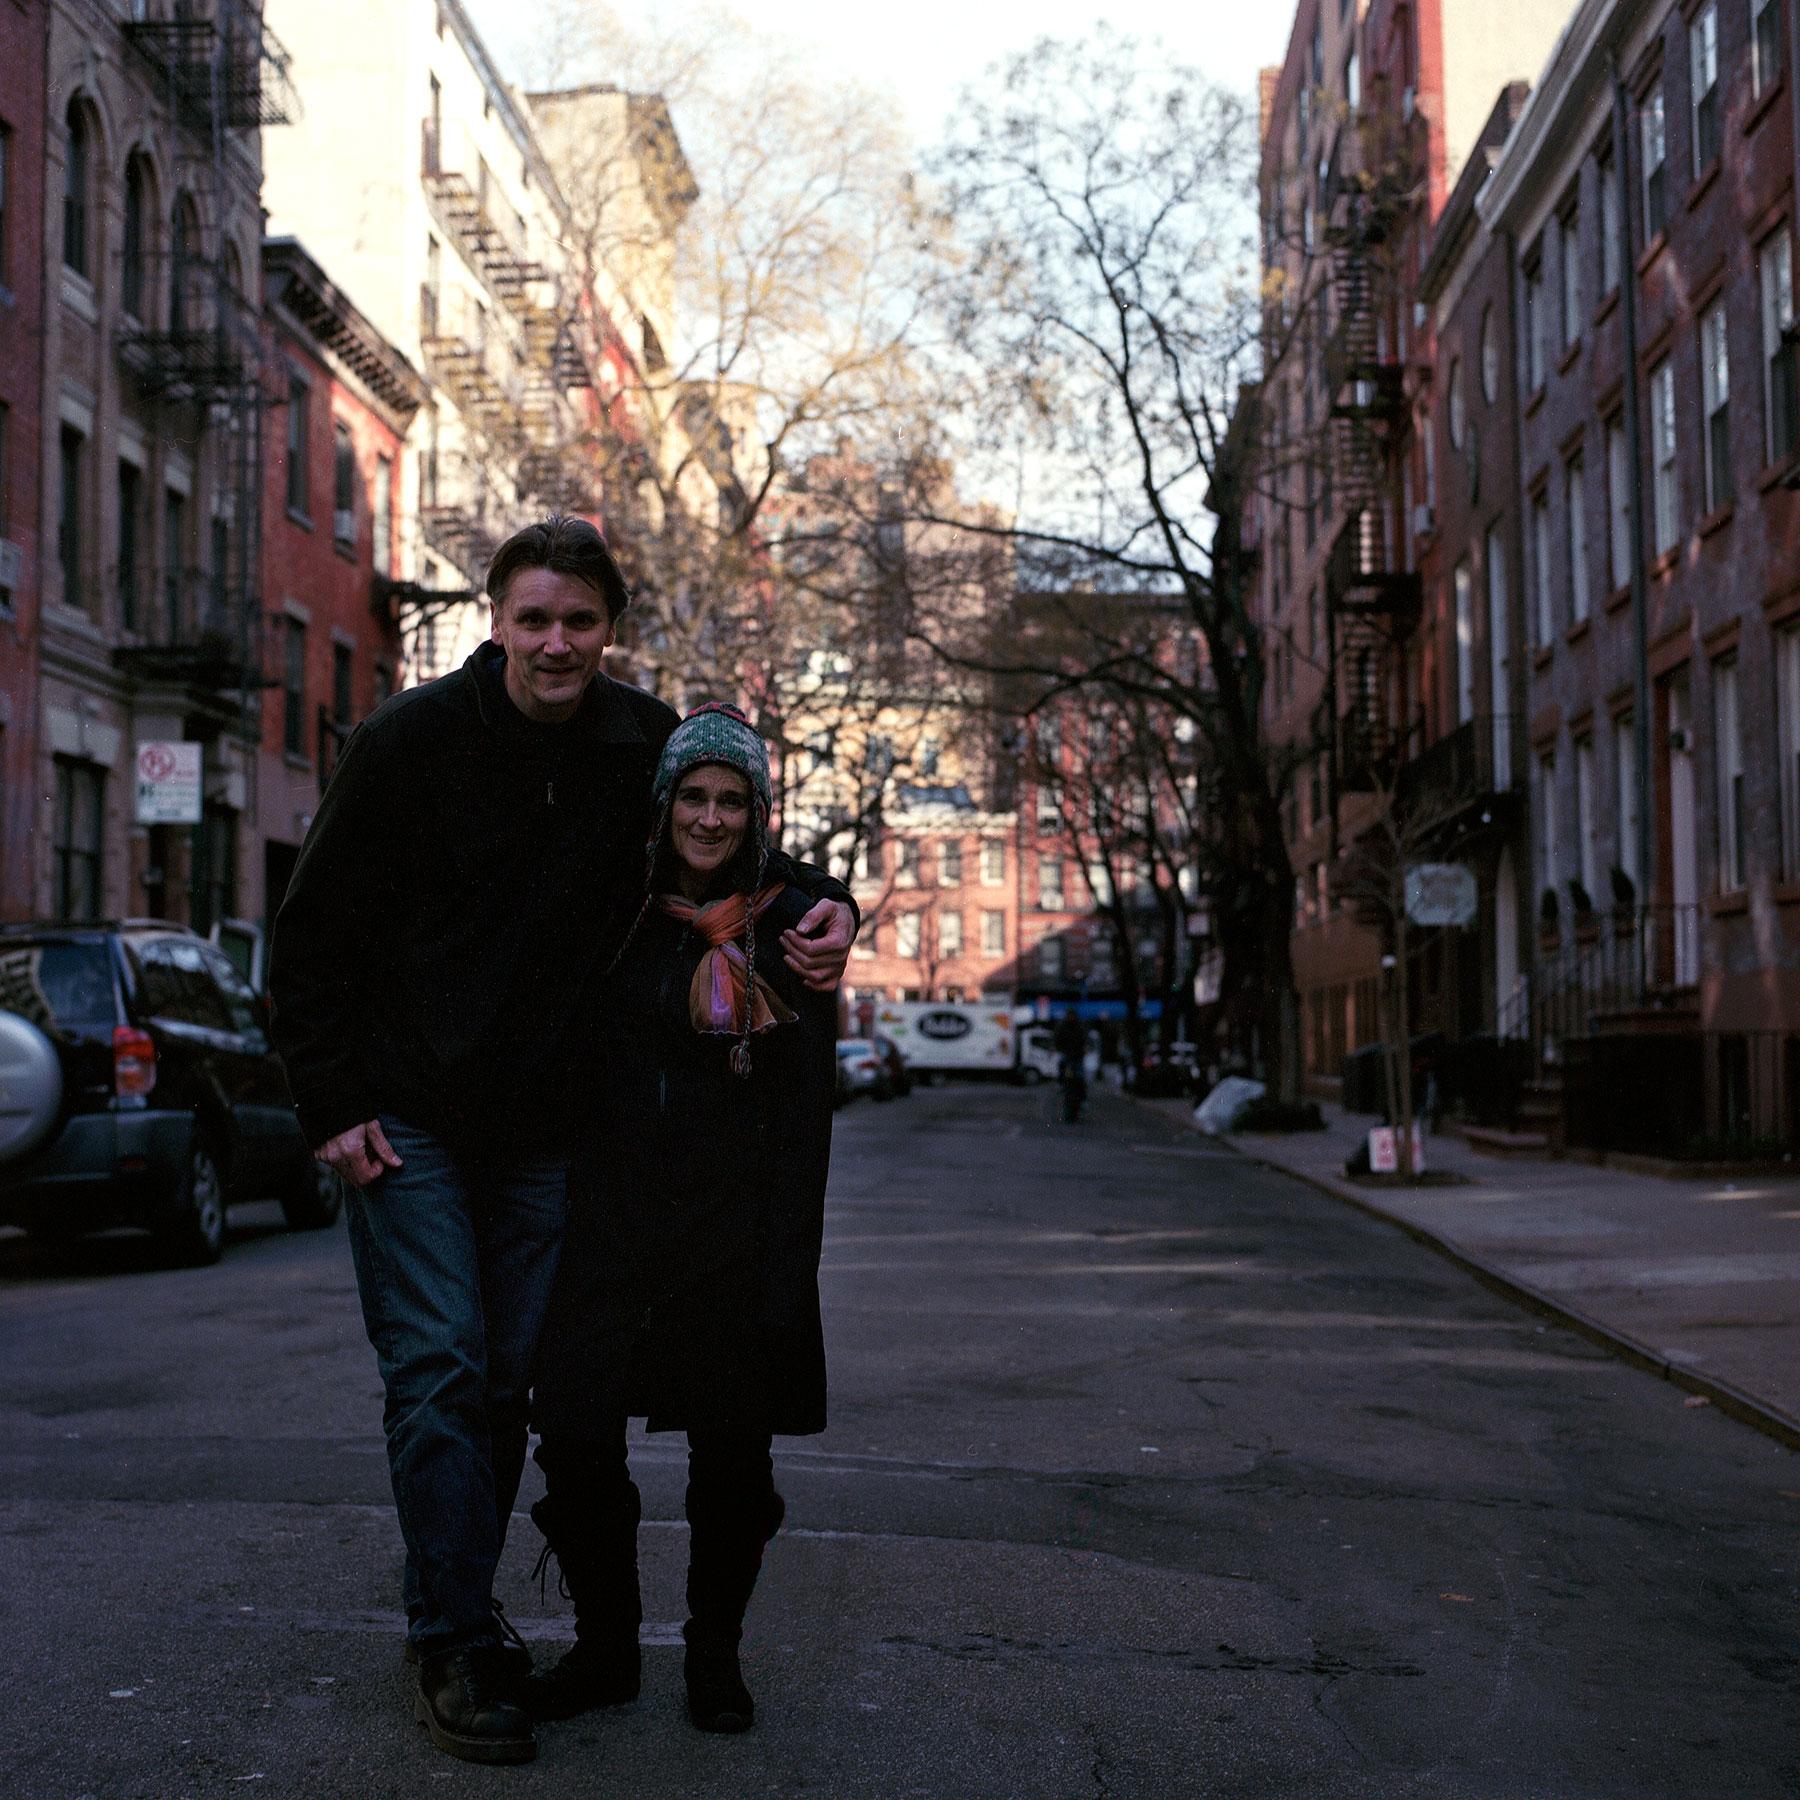 New York City Hasselblad500cm Kodak Portra 160nc film